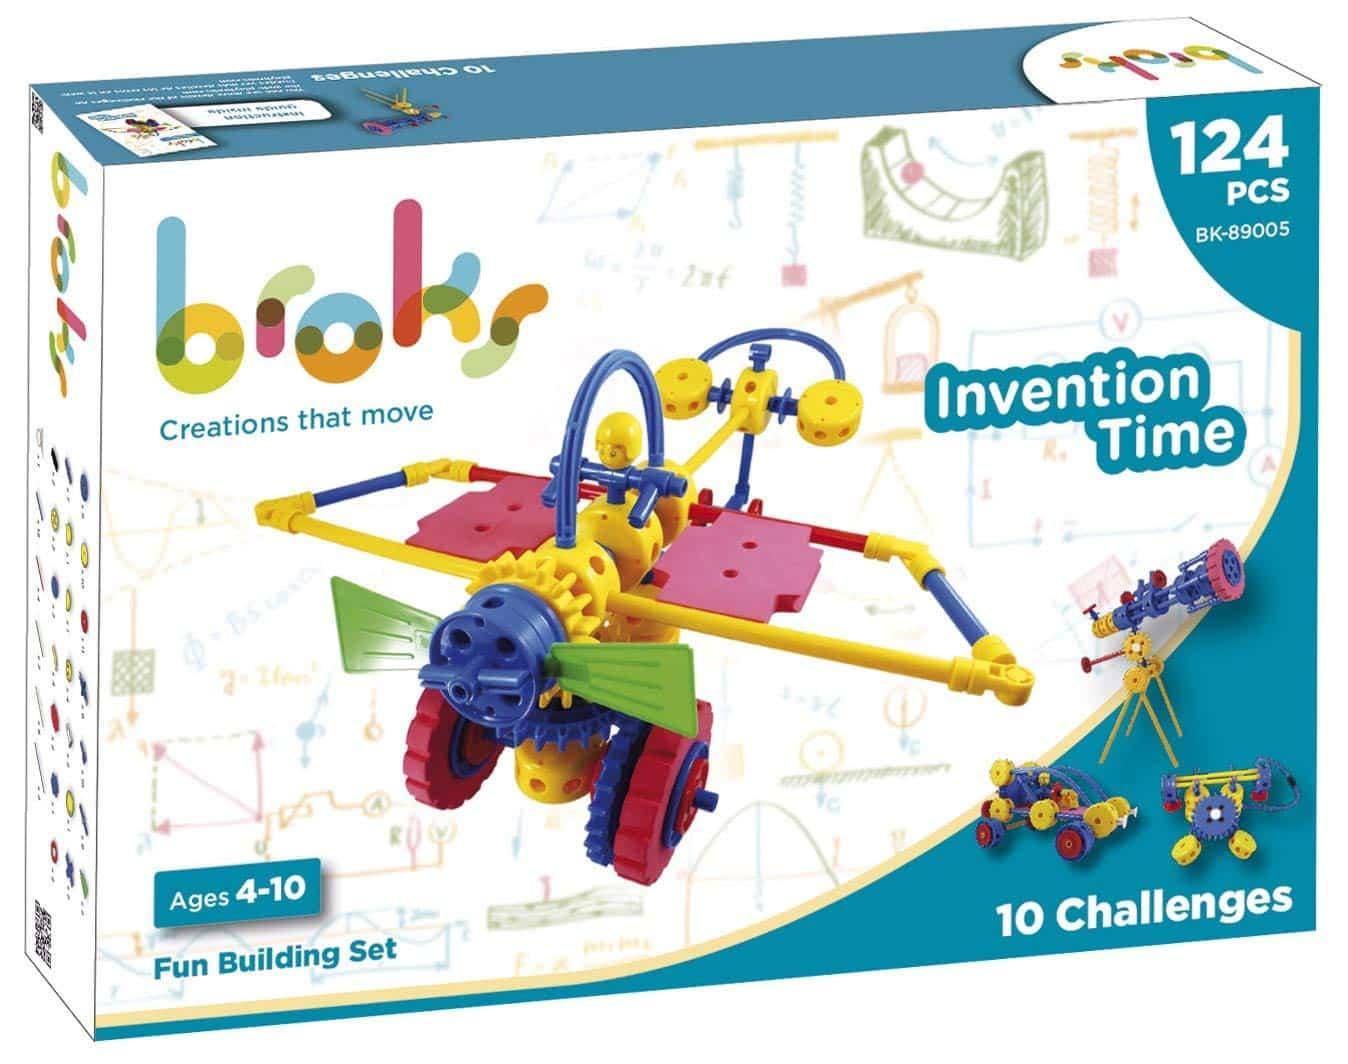 juguetes educativos: Broks Invention time